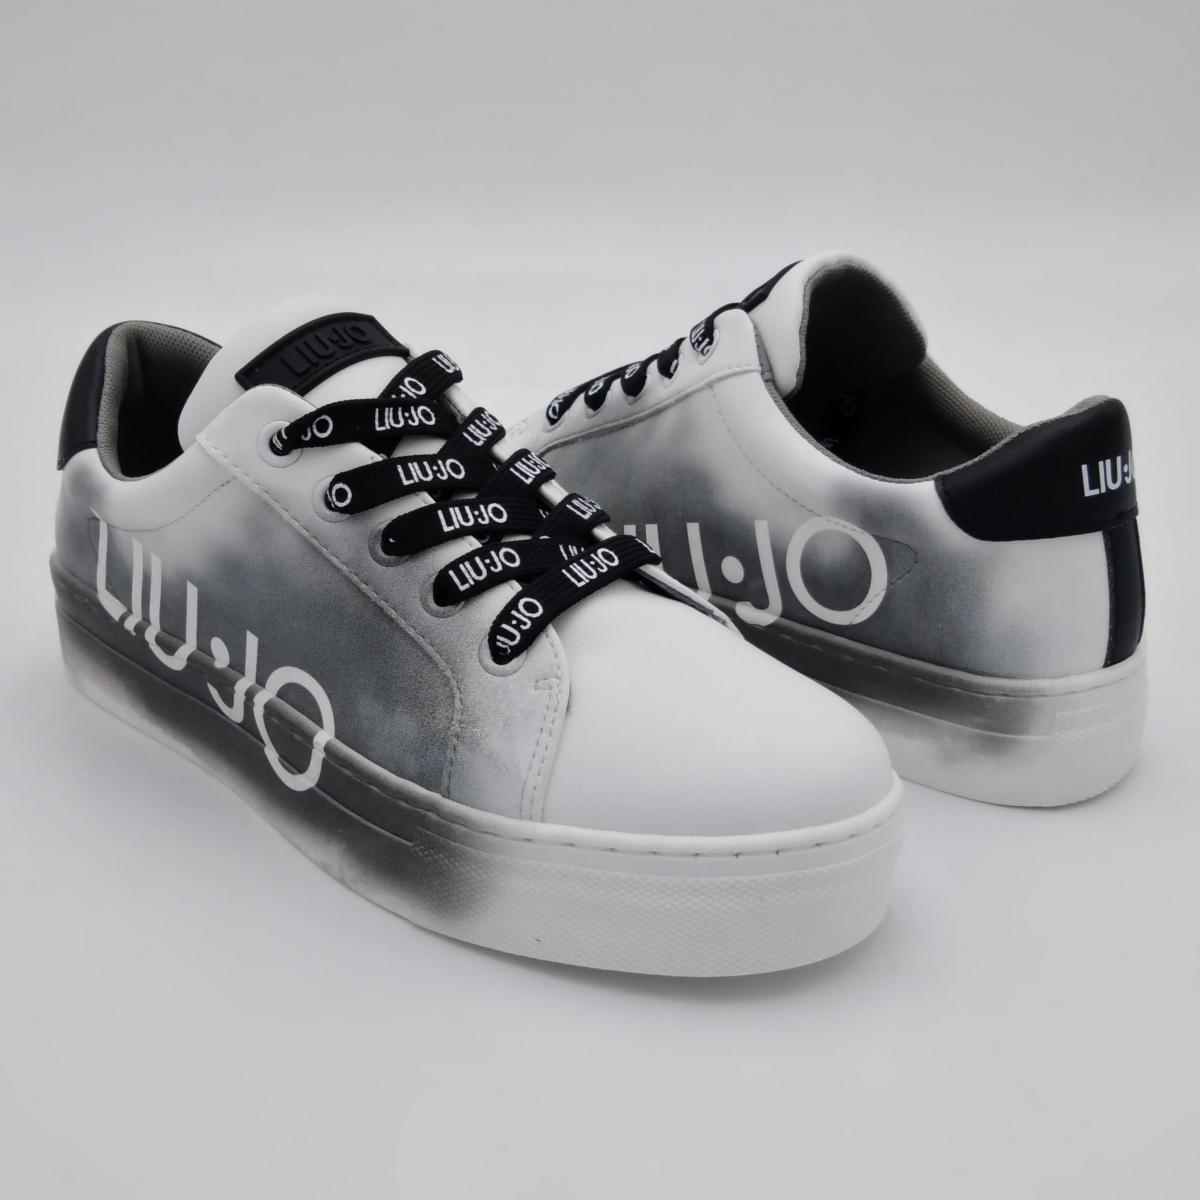 Liu Jo Alicia 171-Sneaker...